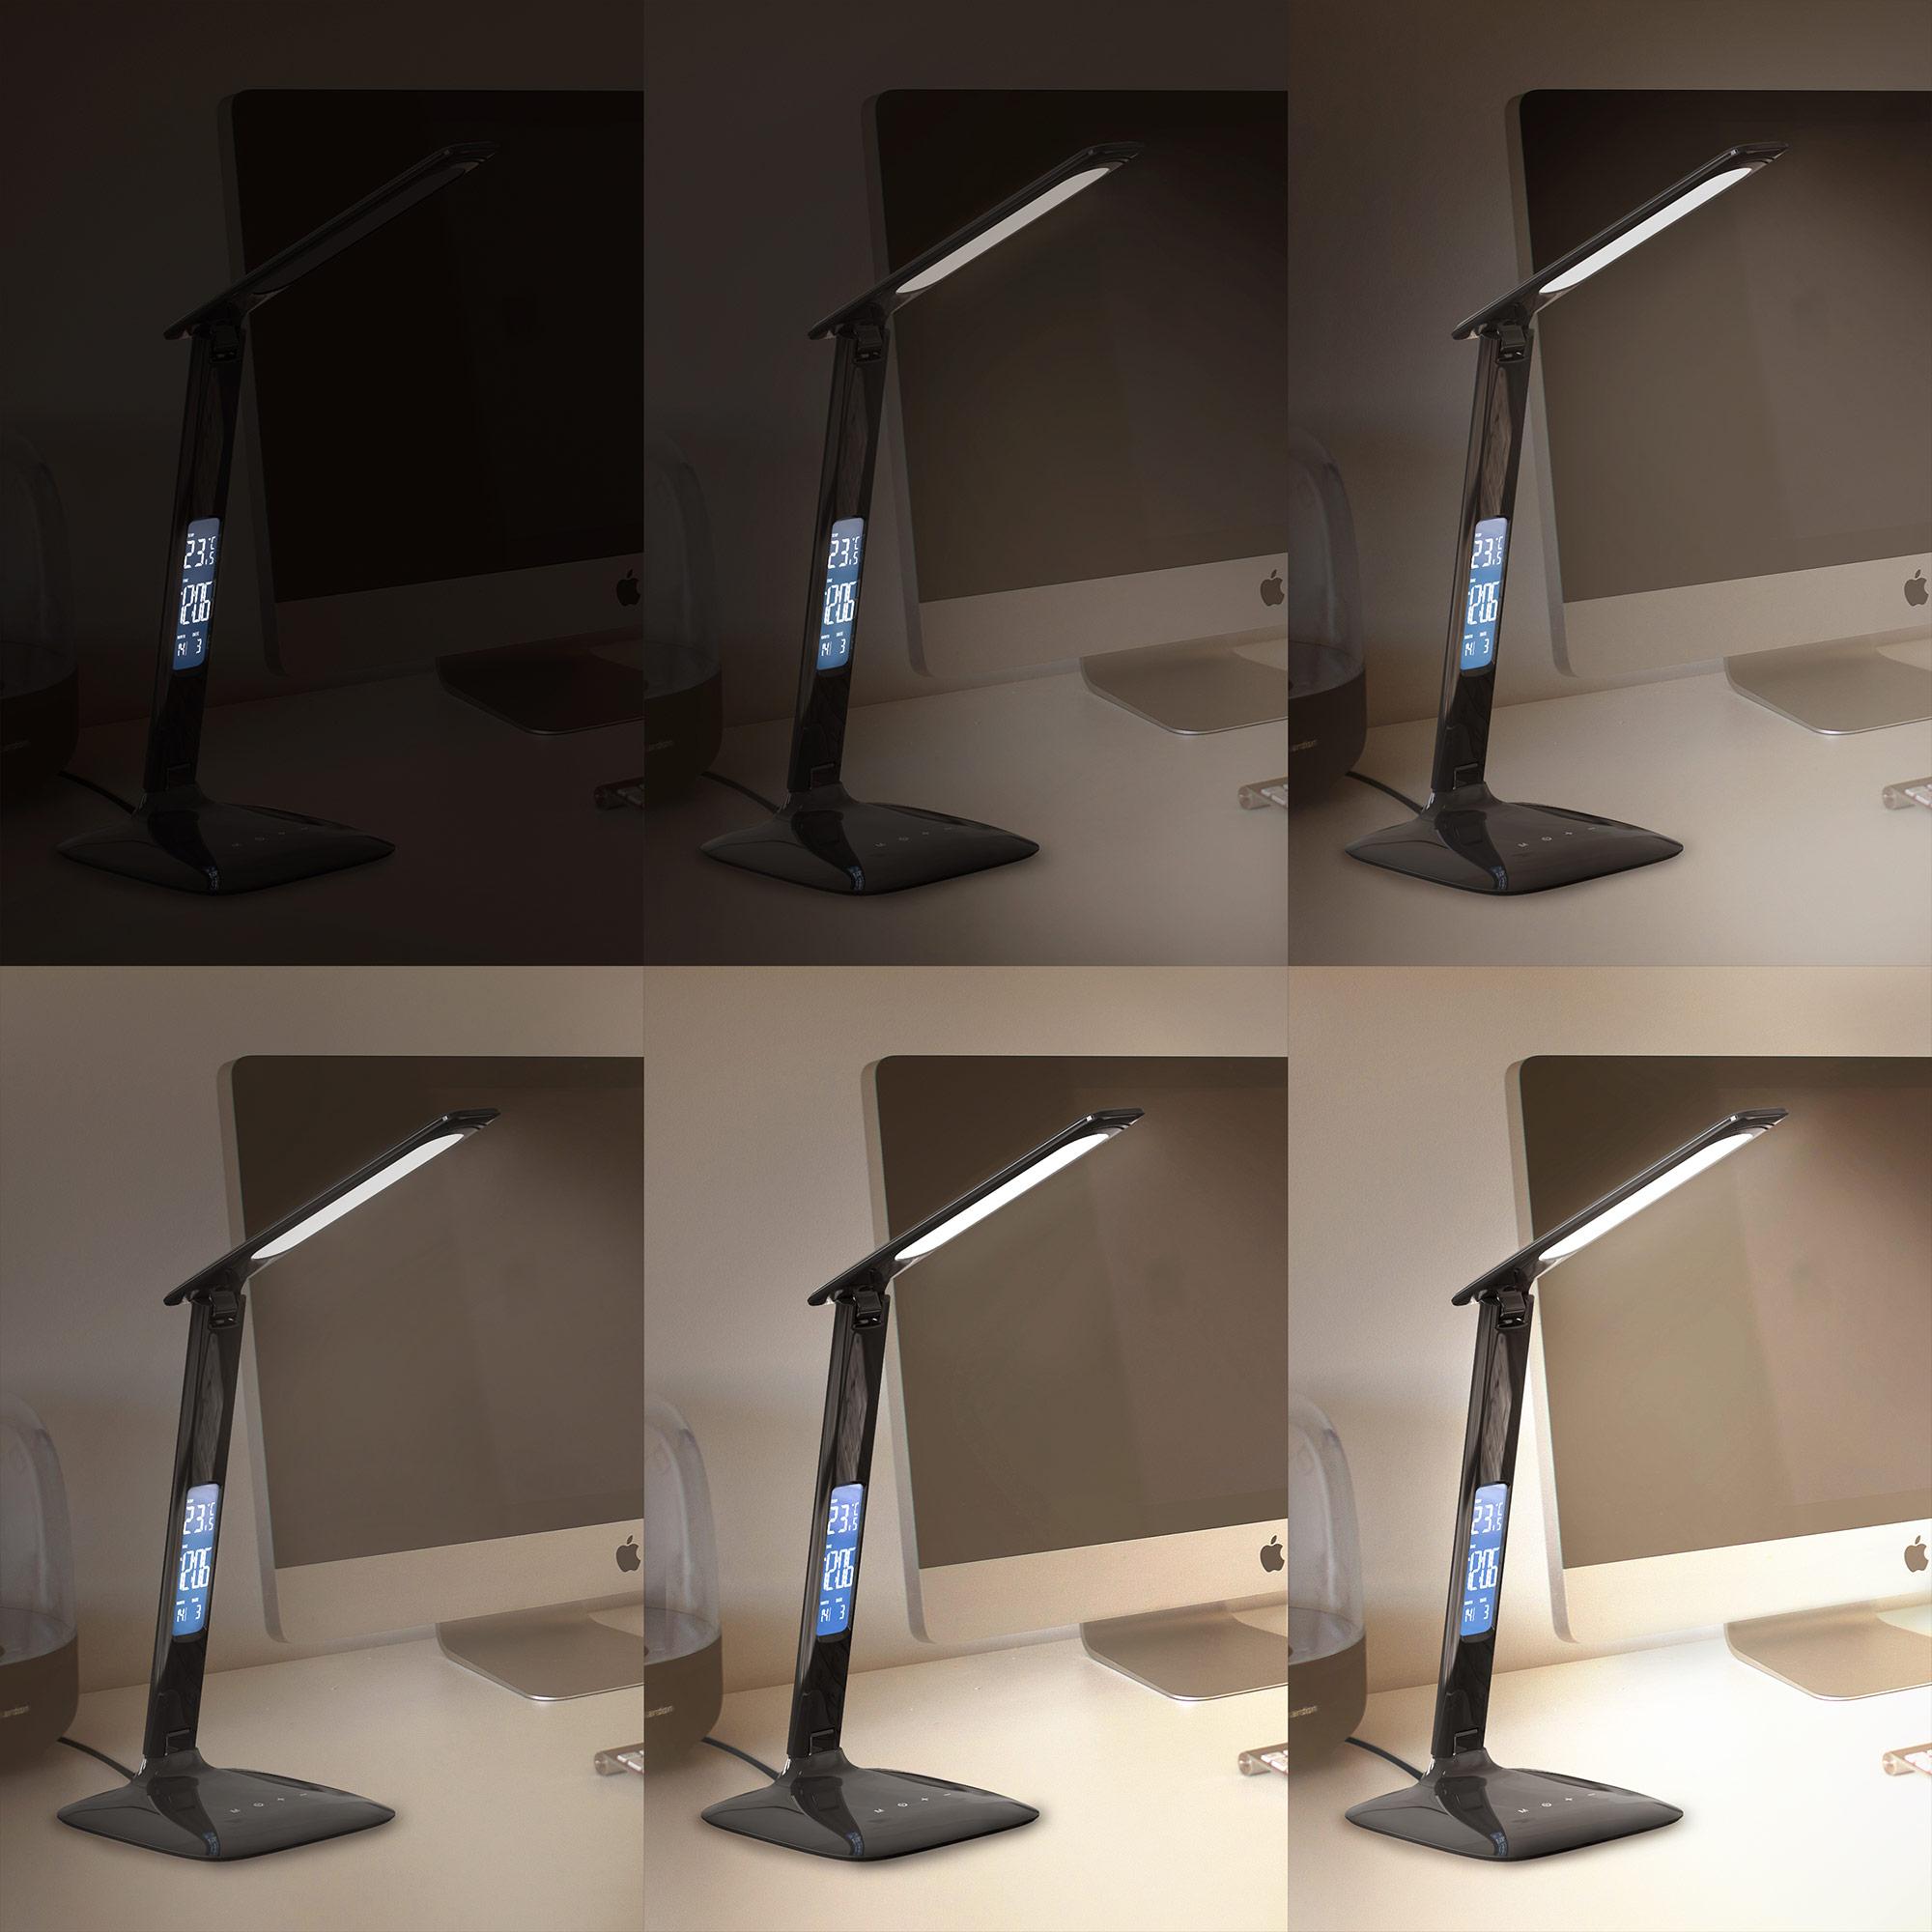 301770-Calendar-Desk-Lamp-5-Lichtstufen.jpg